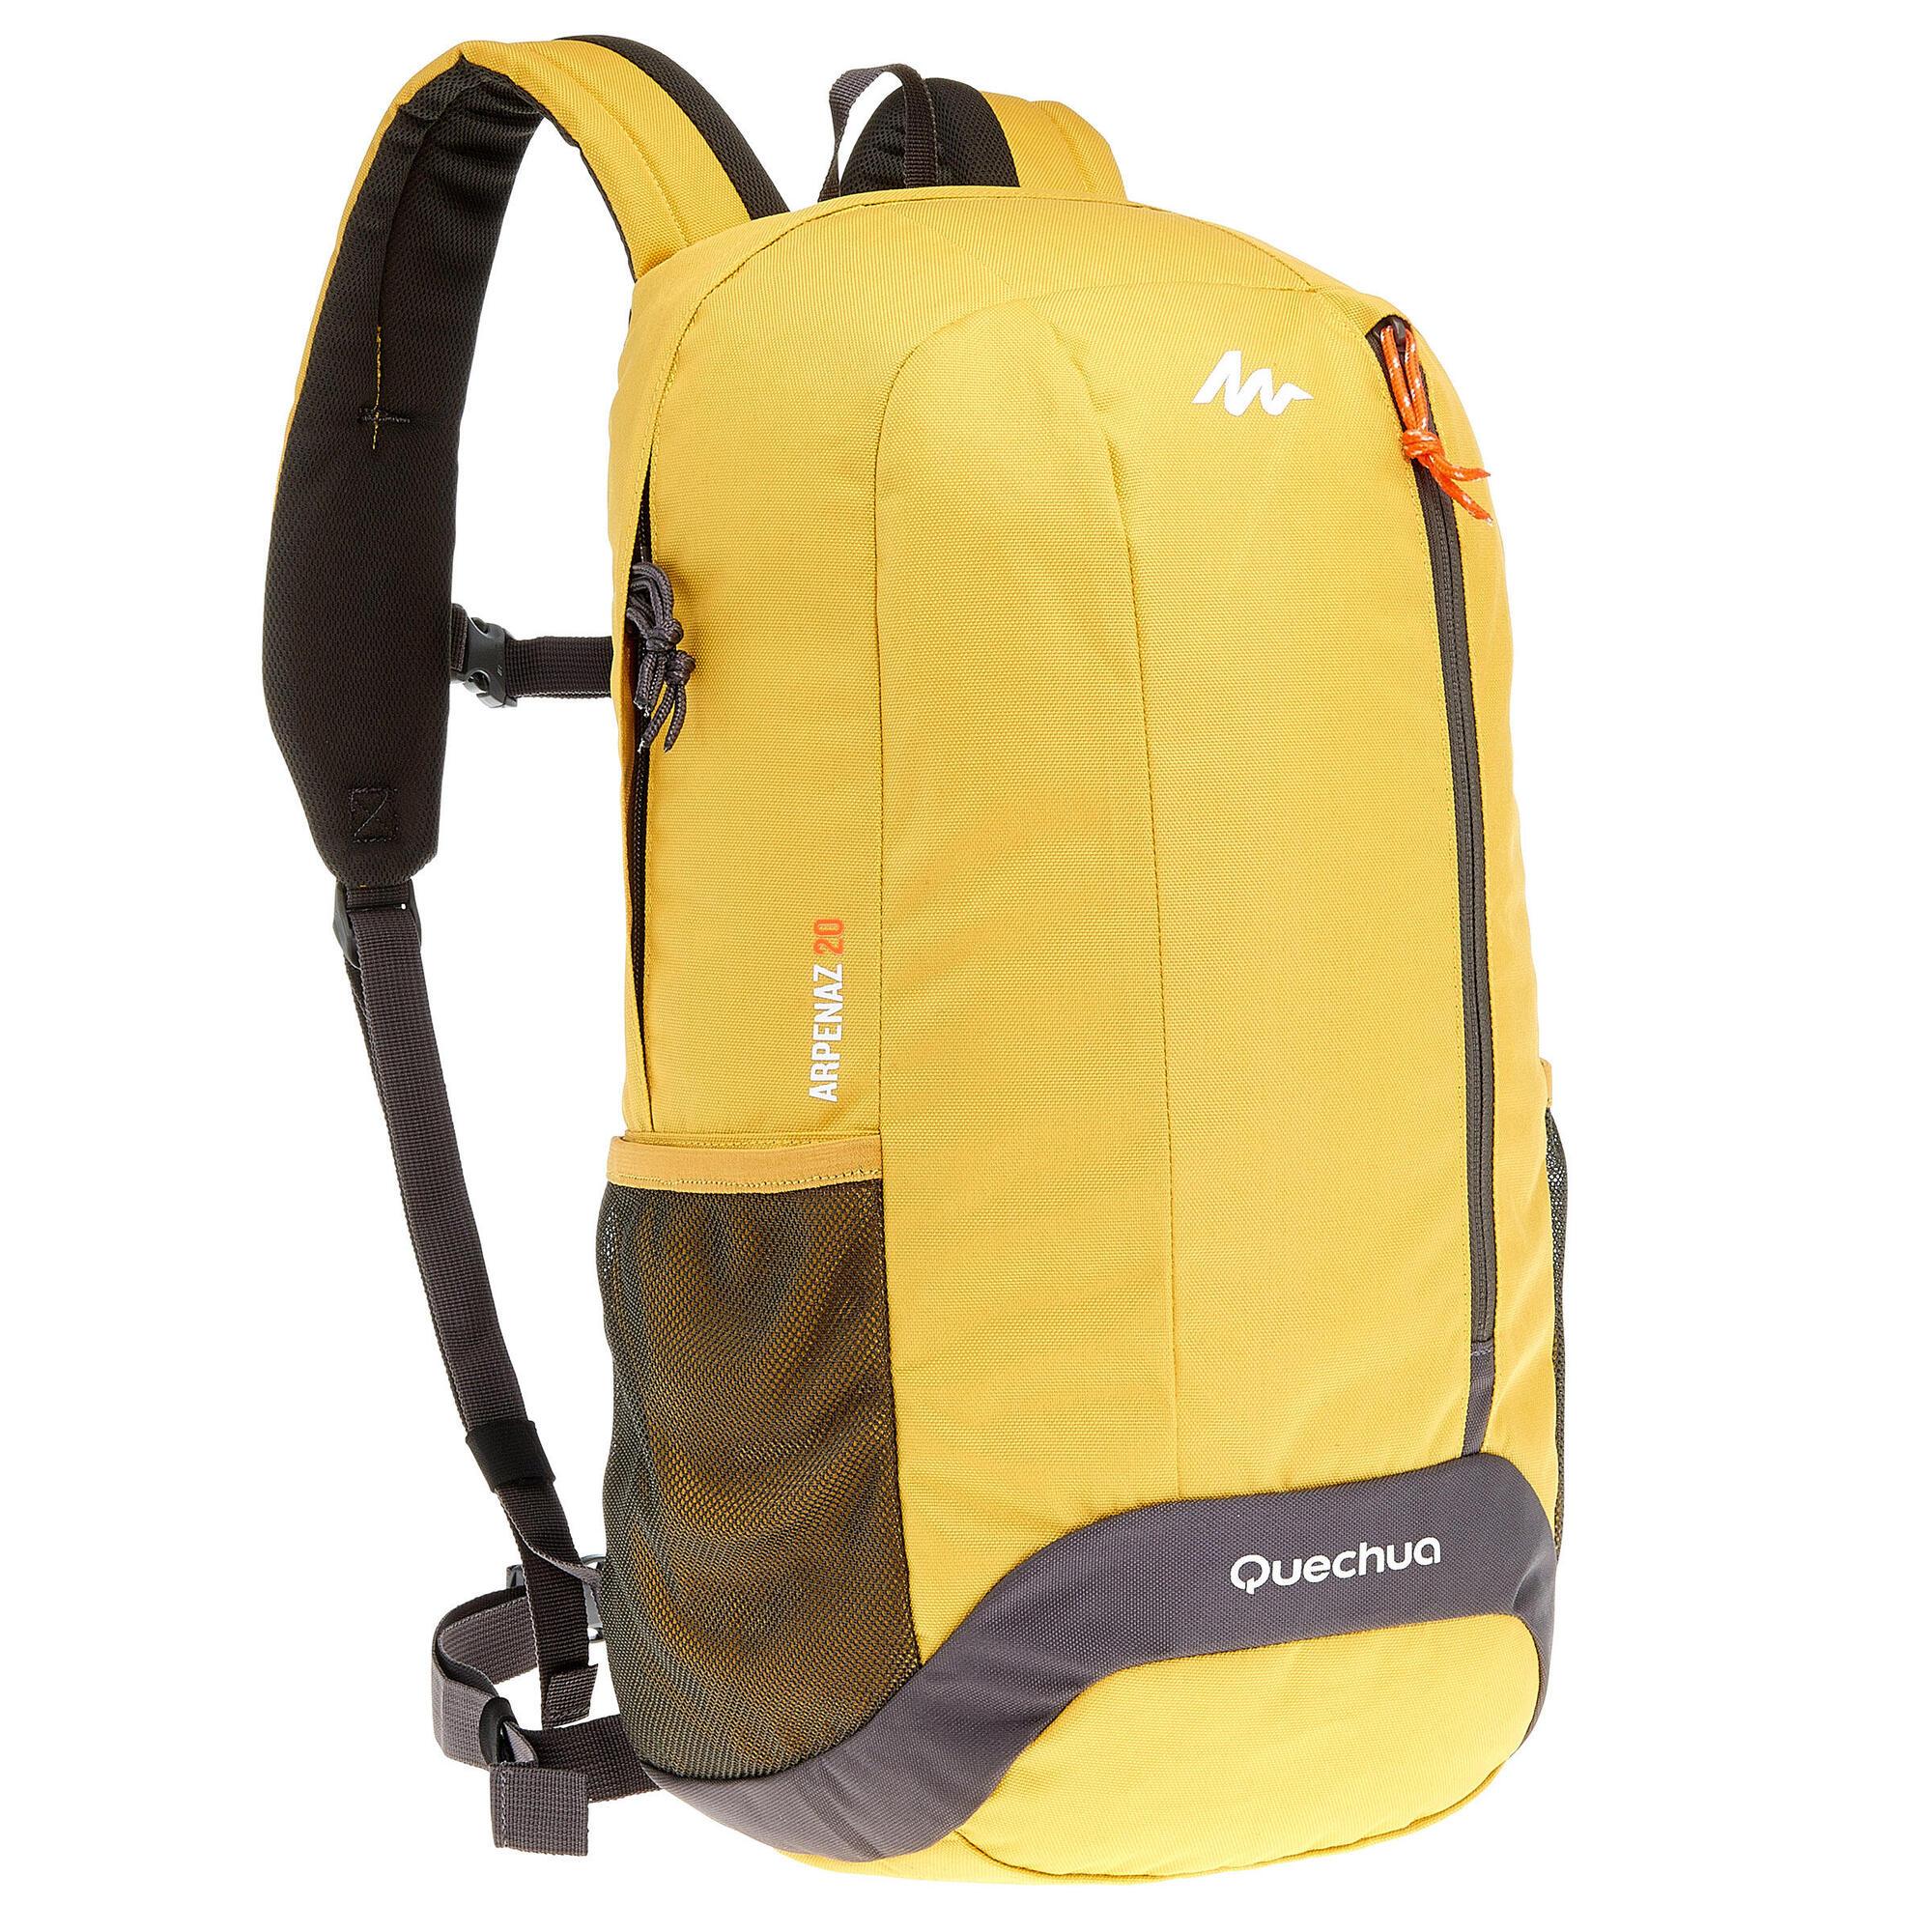 Nh100 20l Hiking Backpack Yellow Grey Quechua